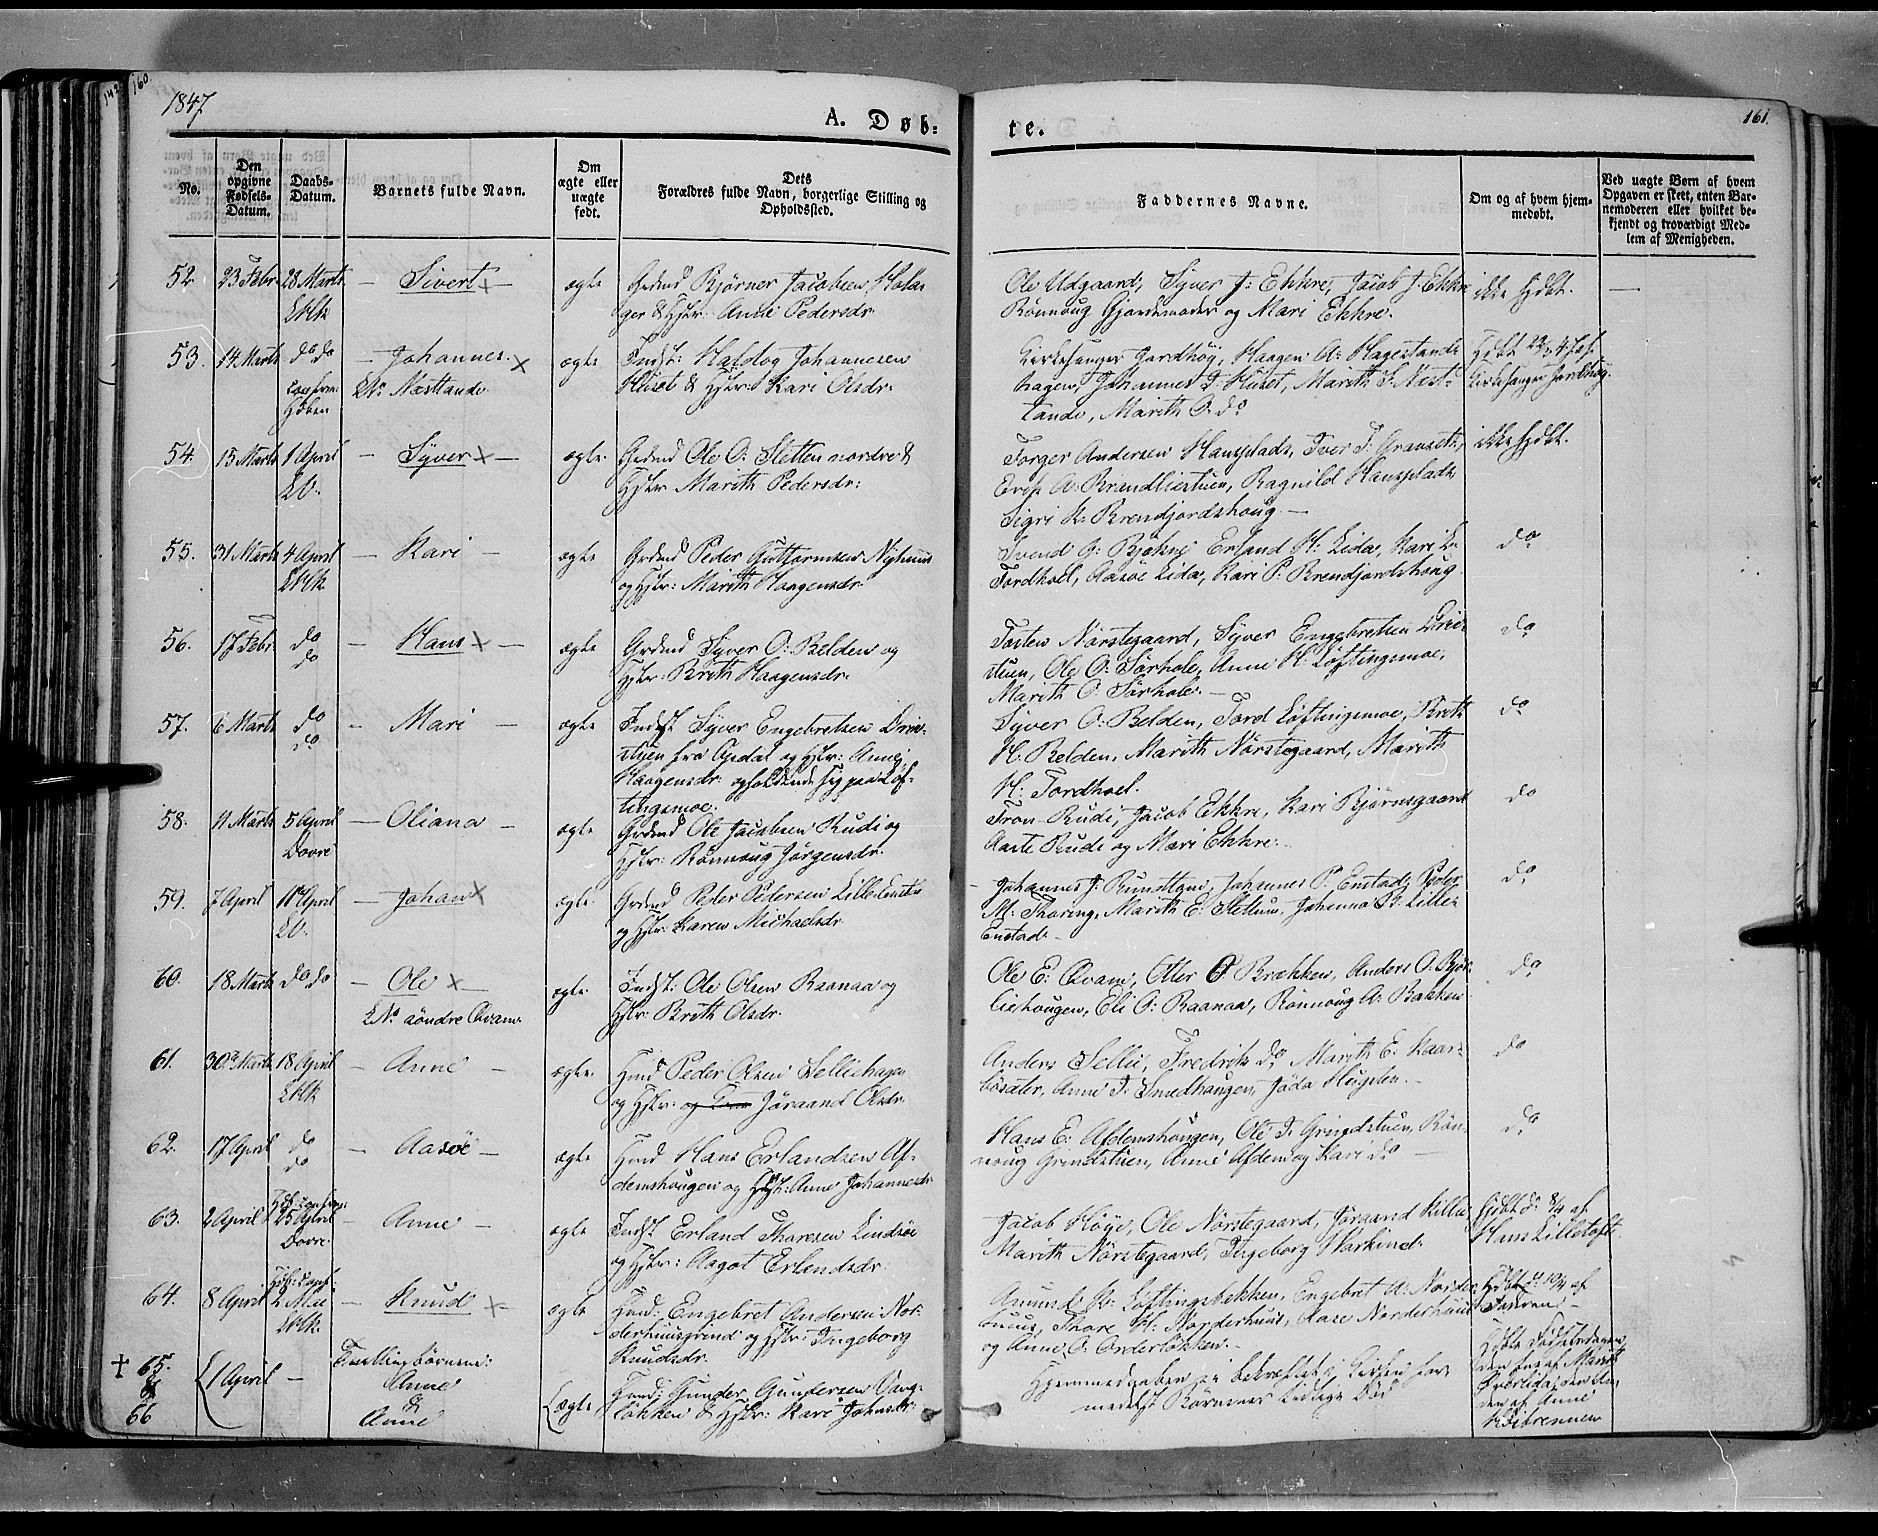 SAH, Lesja prestekontor, Ministerialbok nr. 6A, 1843-1854, s. 160-161